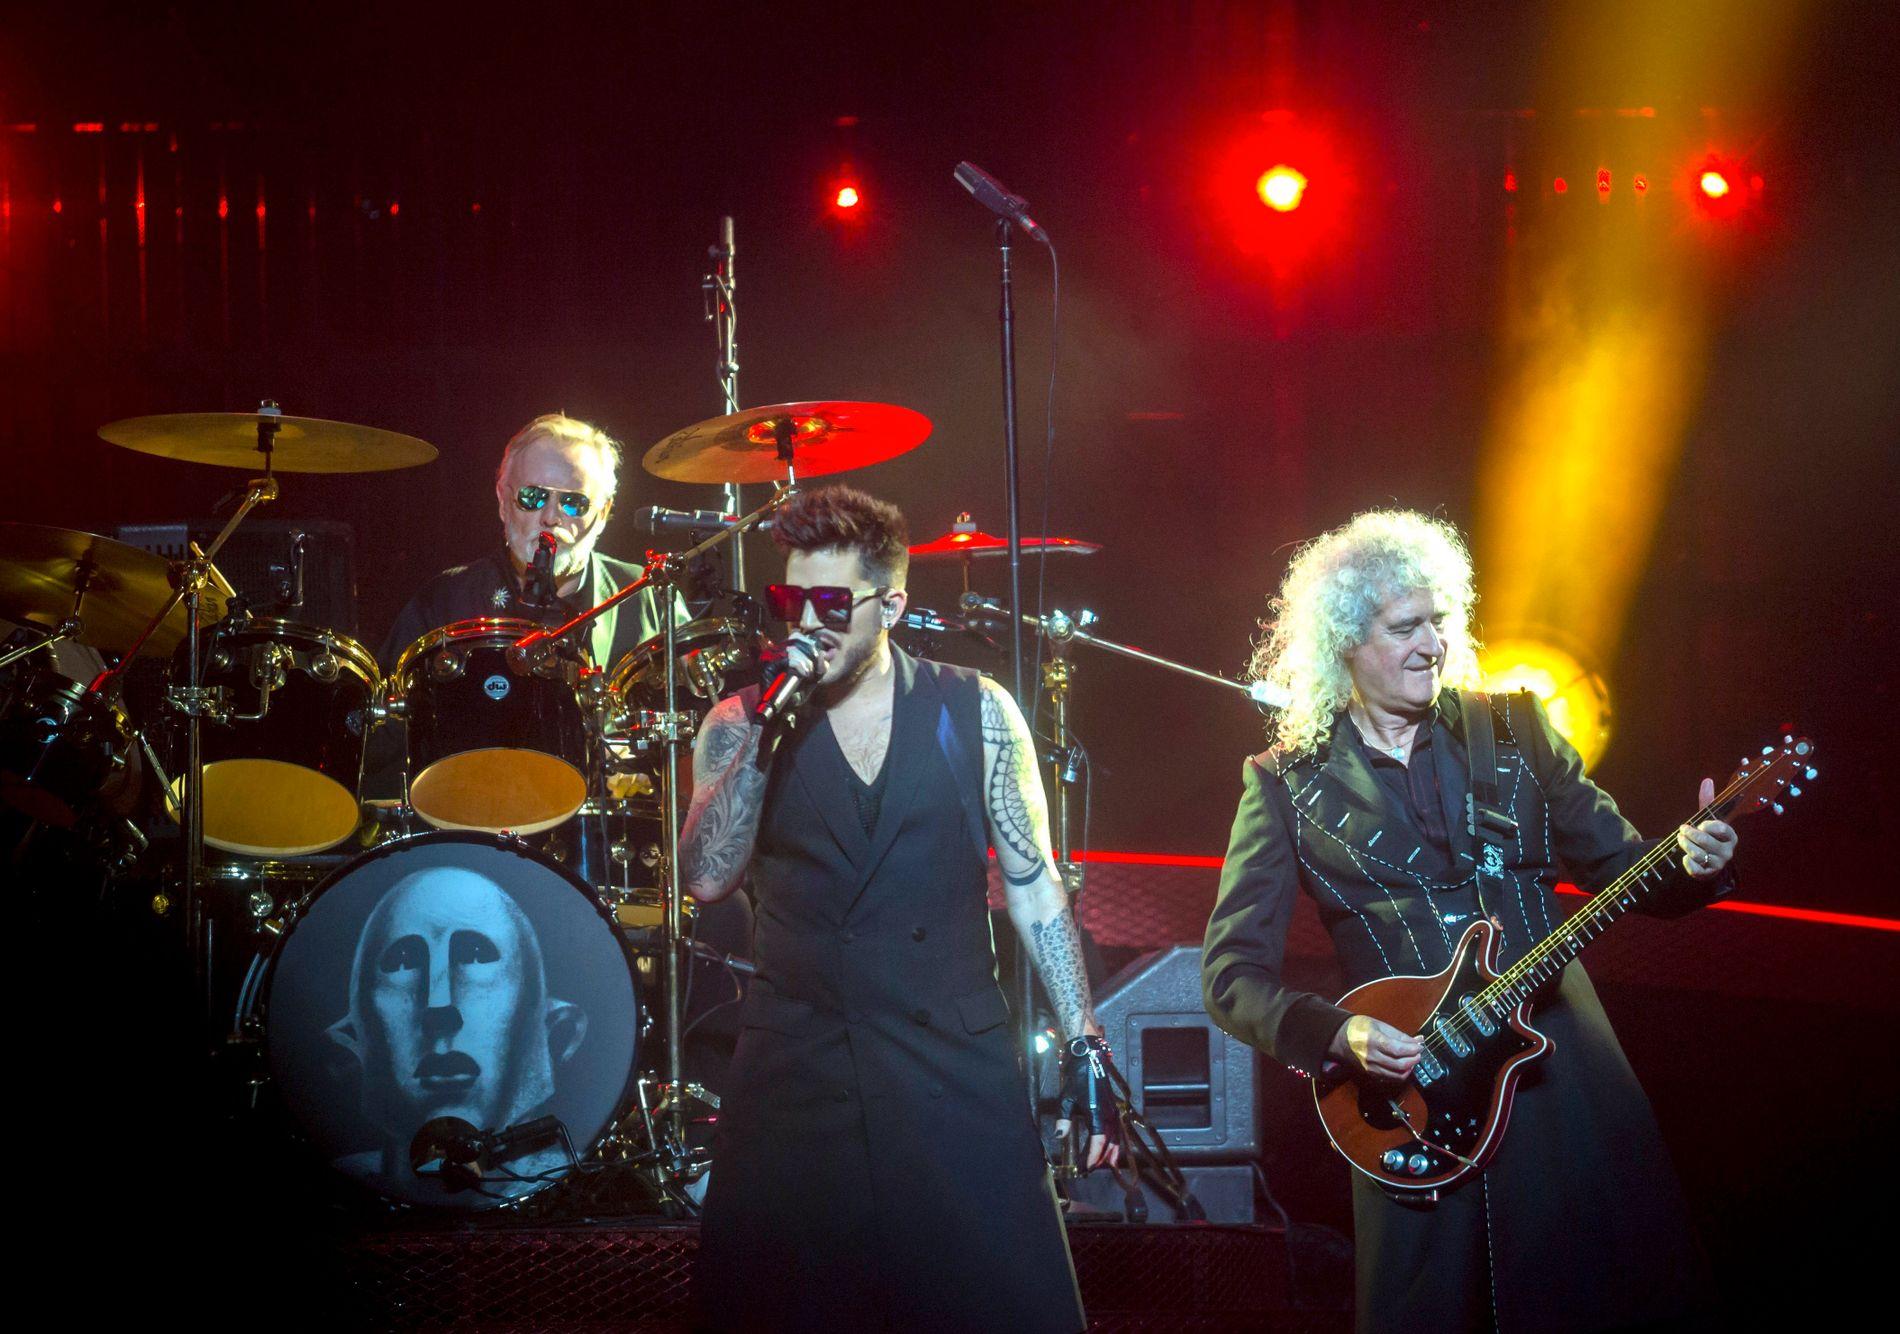 HOLDER DET GÅENDE: Amerikanske Adam Lambert med den originale Queen-gitaristen Brian May ved sin side, på scenen i Ungarn i fjor høst.